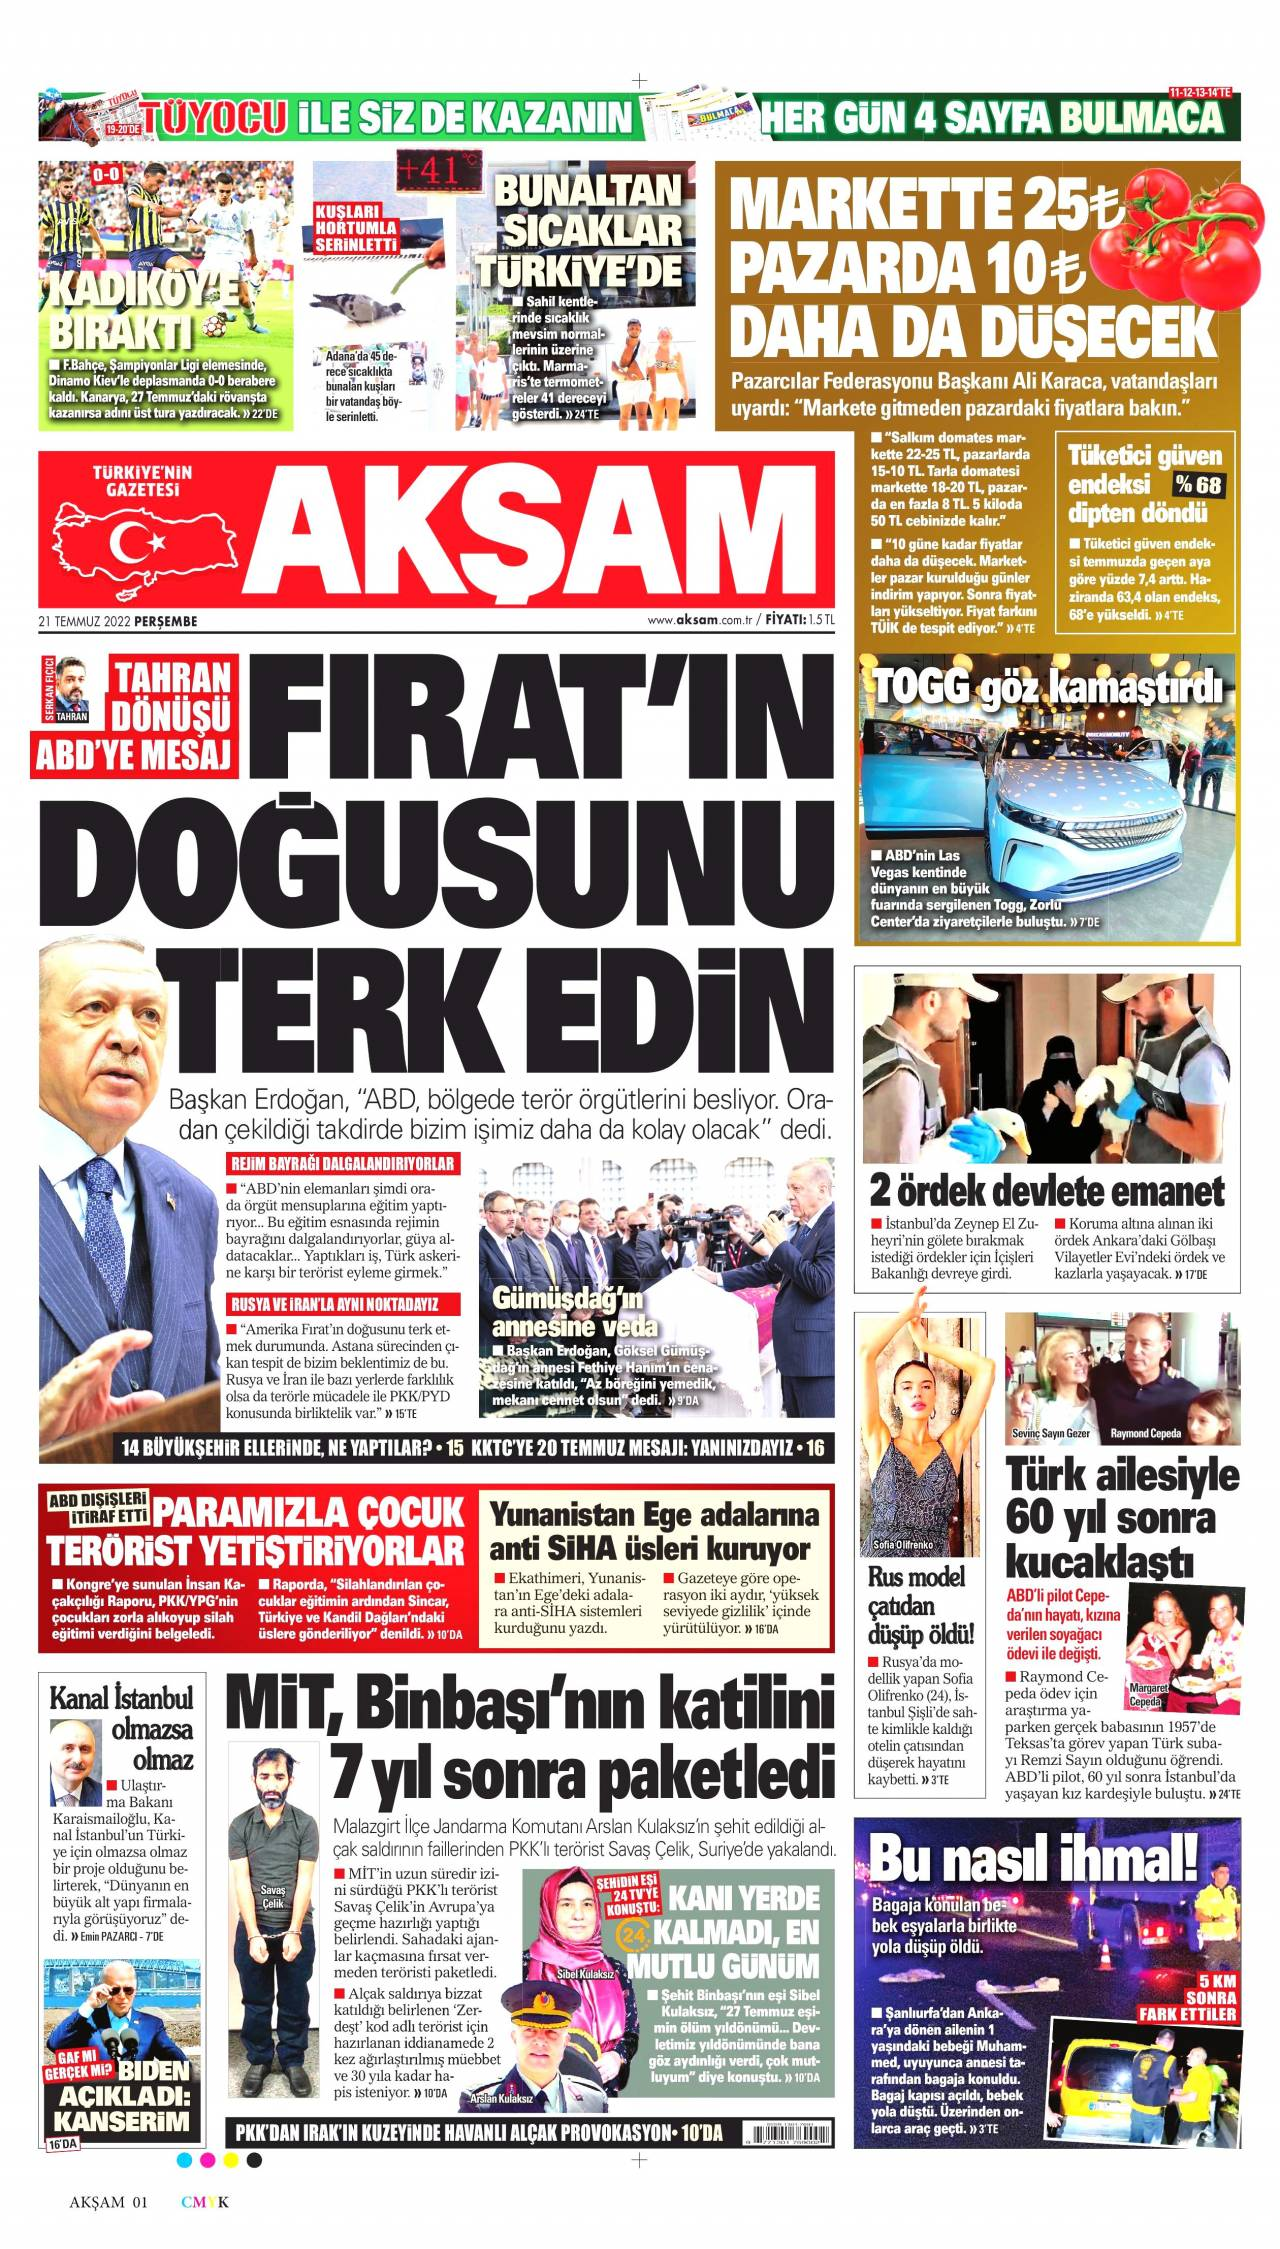 23 Eylül 2020, Çarşamba aksam Gazetesi